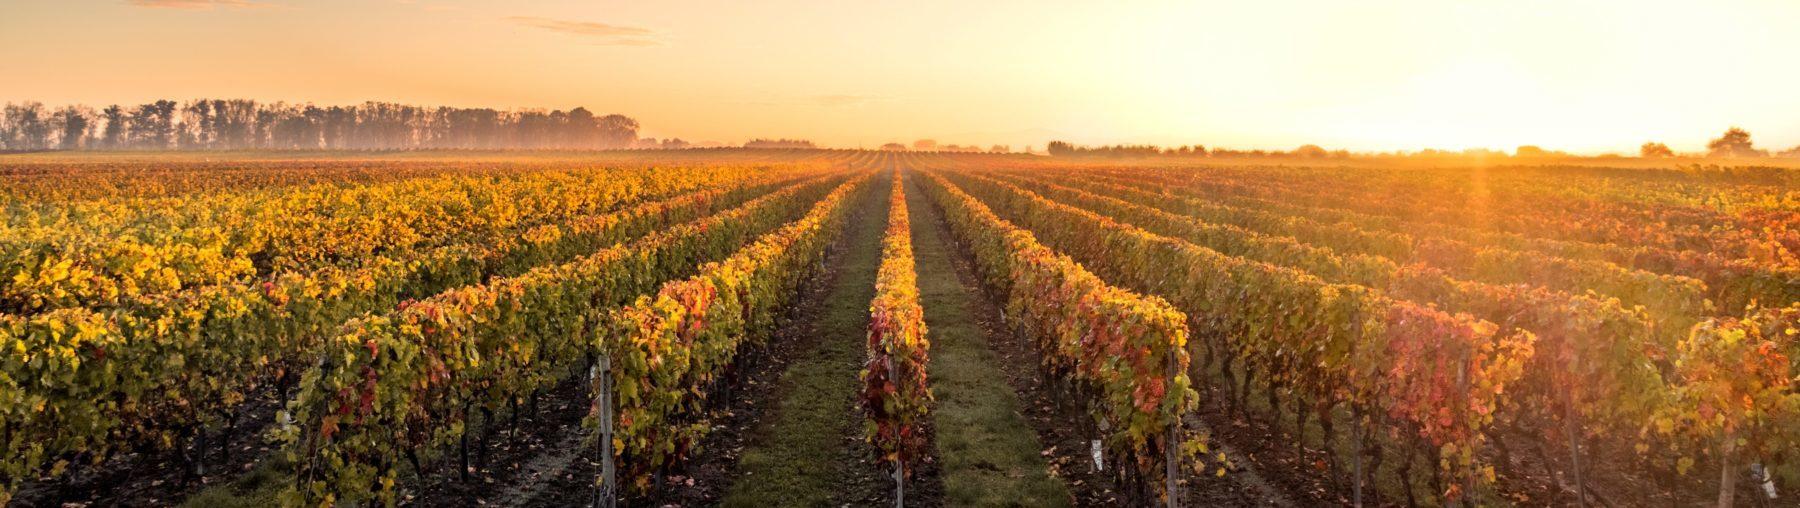 vin elegance tara abernethy wine imports canada